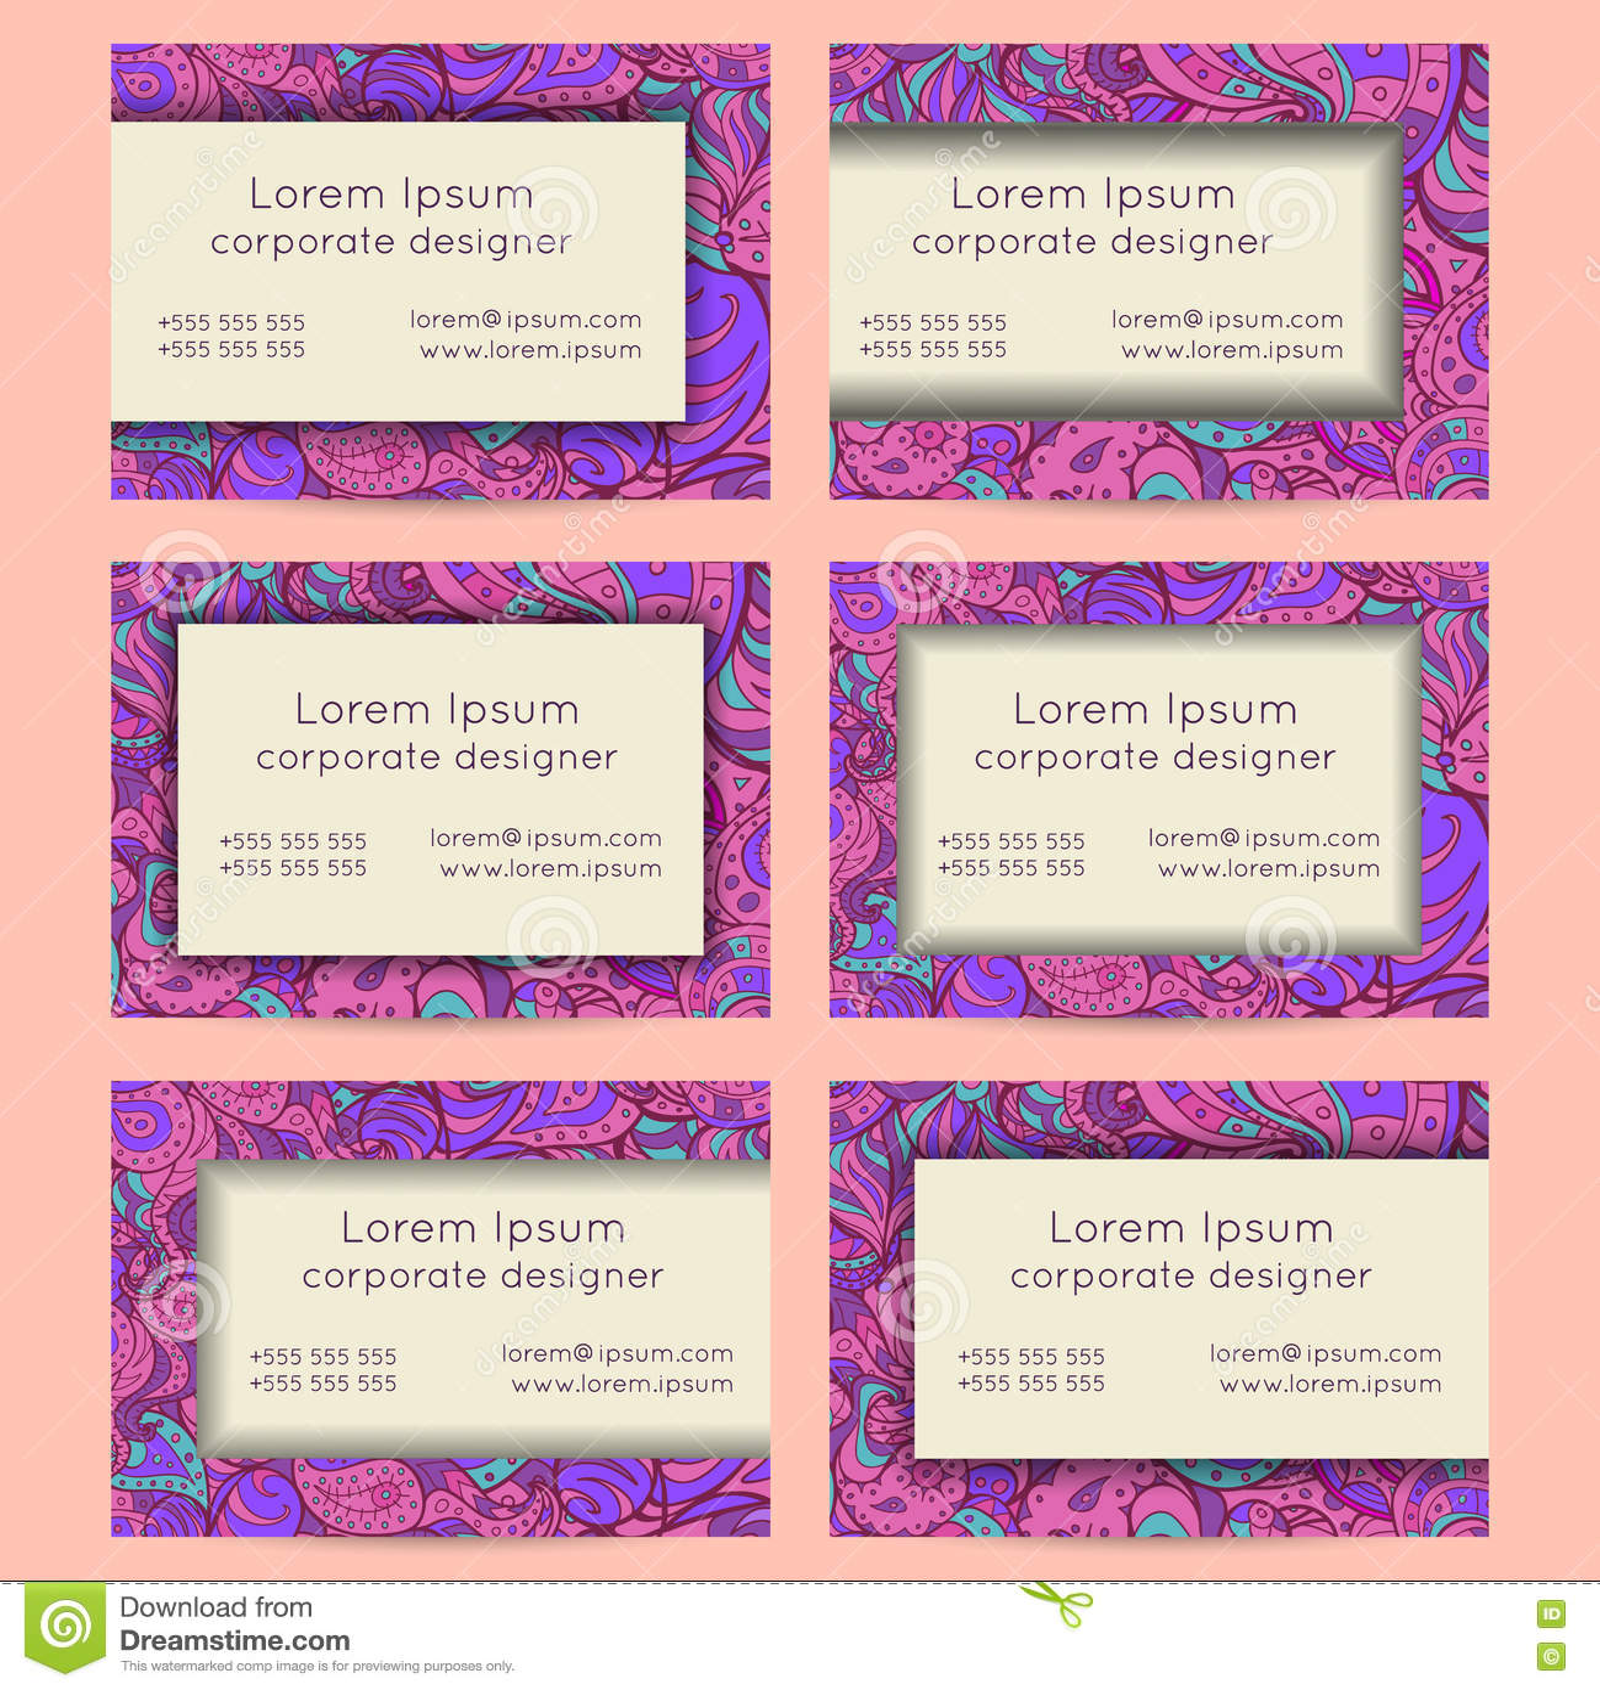 Floral boho paisley business cards templates stock vector image floral boho paisley business cards templates magicingreecefo Images